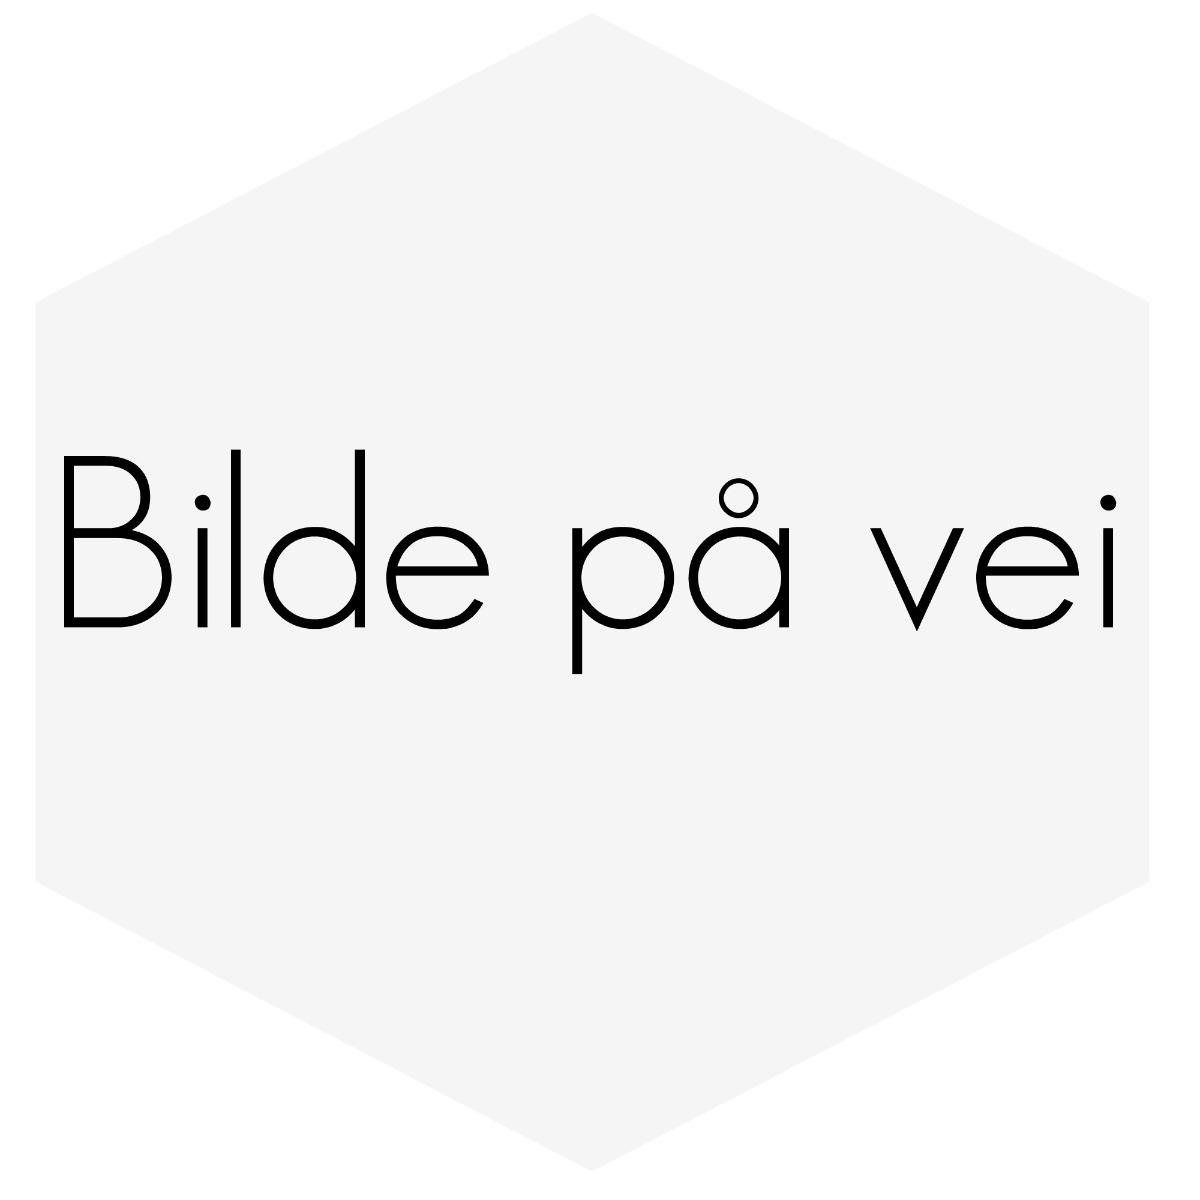 "SILIKONSLANGE RØD REDUSERING 2,5-3,5"" (63-89MM)"